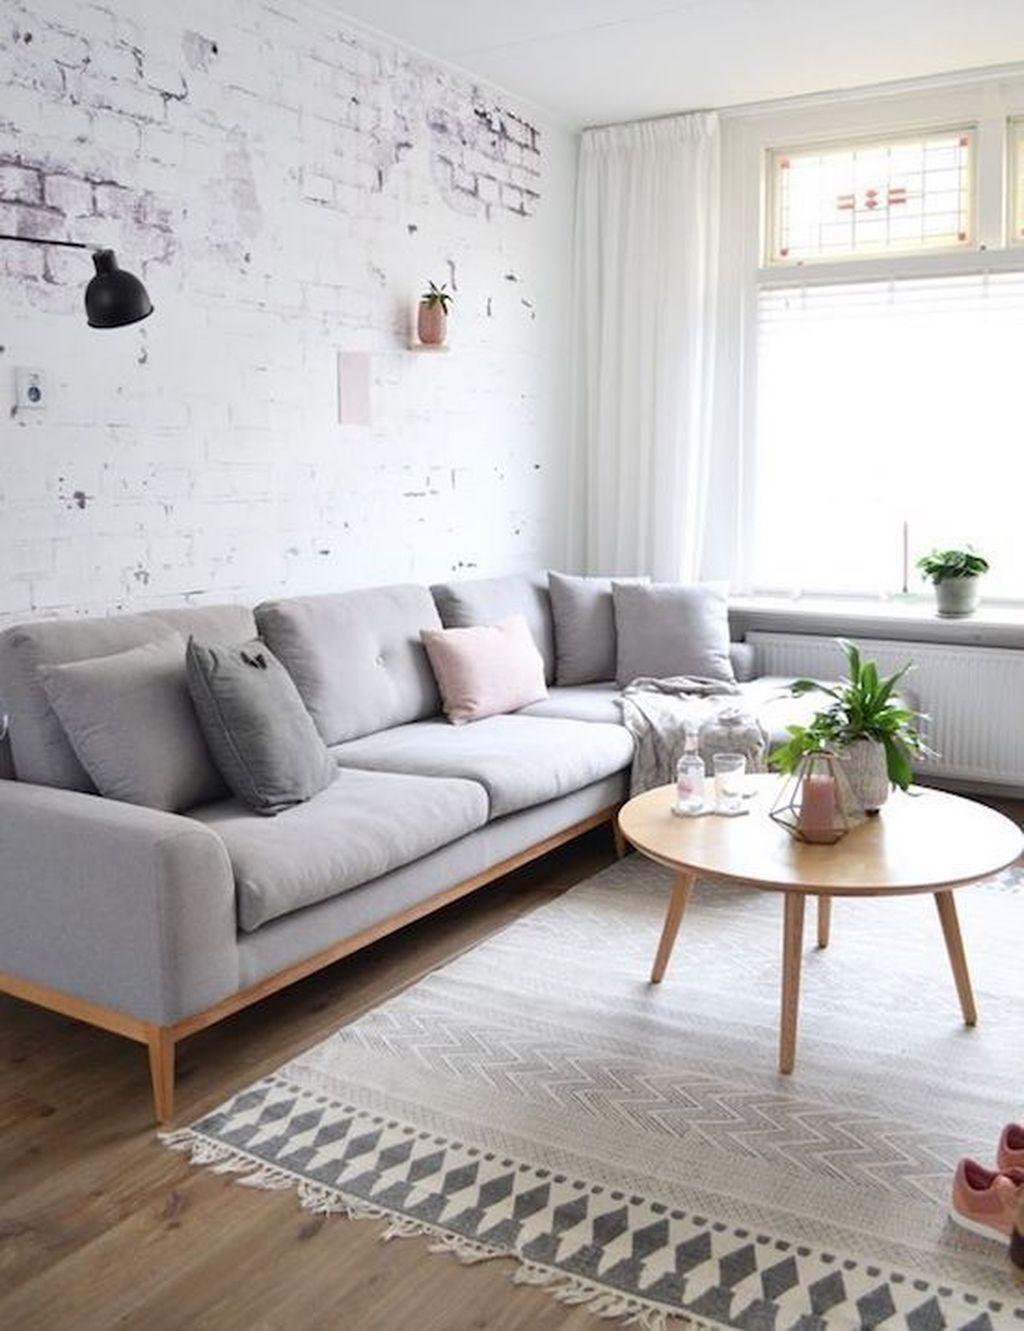 40 Amazing Minimalist Living Room Design Ideas To Try Minimalist Living Room Living Room Scandinavian Living Room Designs